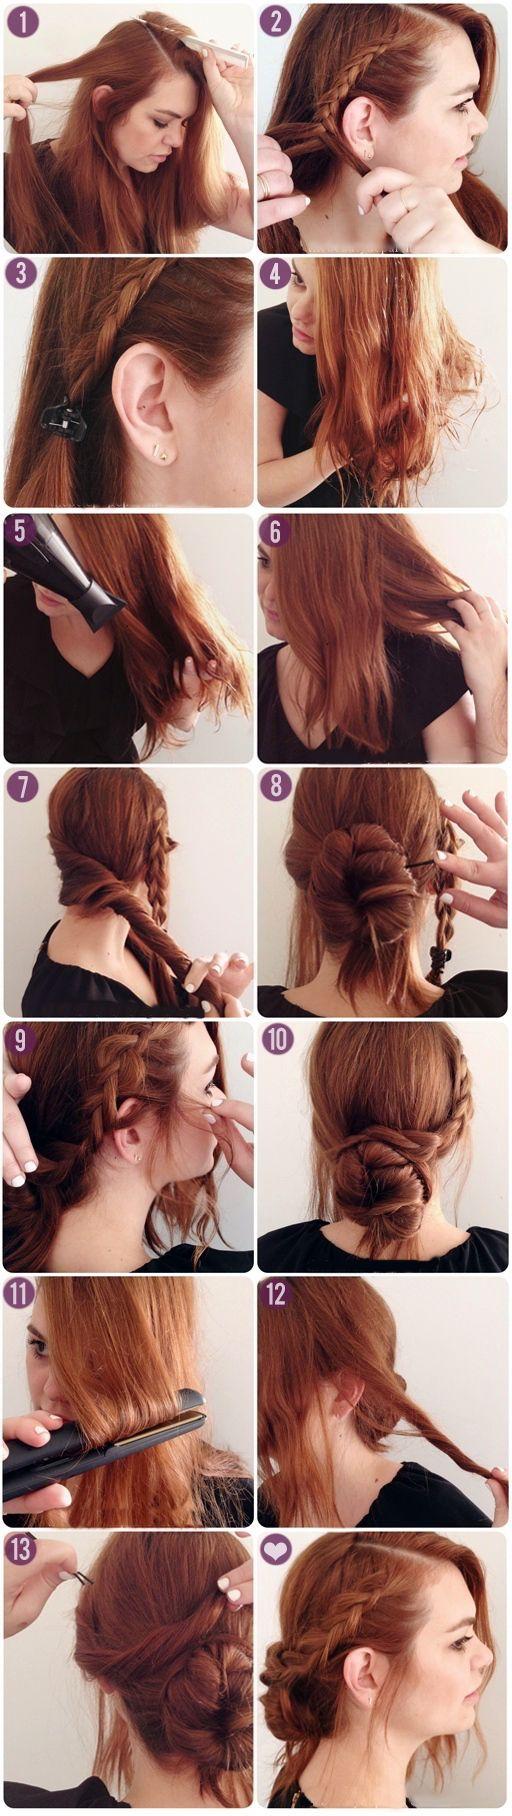 Peinados Faciles Para Pelo Largo Peinado Facil Pelo Largo Y Peinados - Peinado-facil-pelo-largo